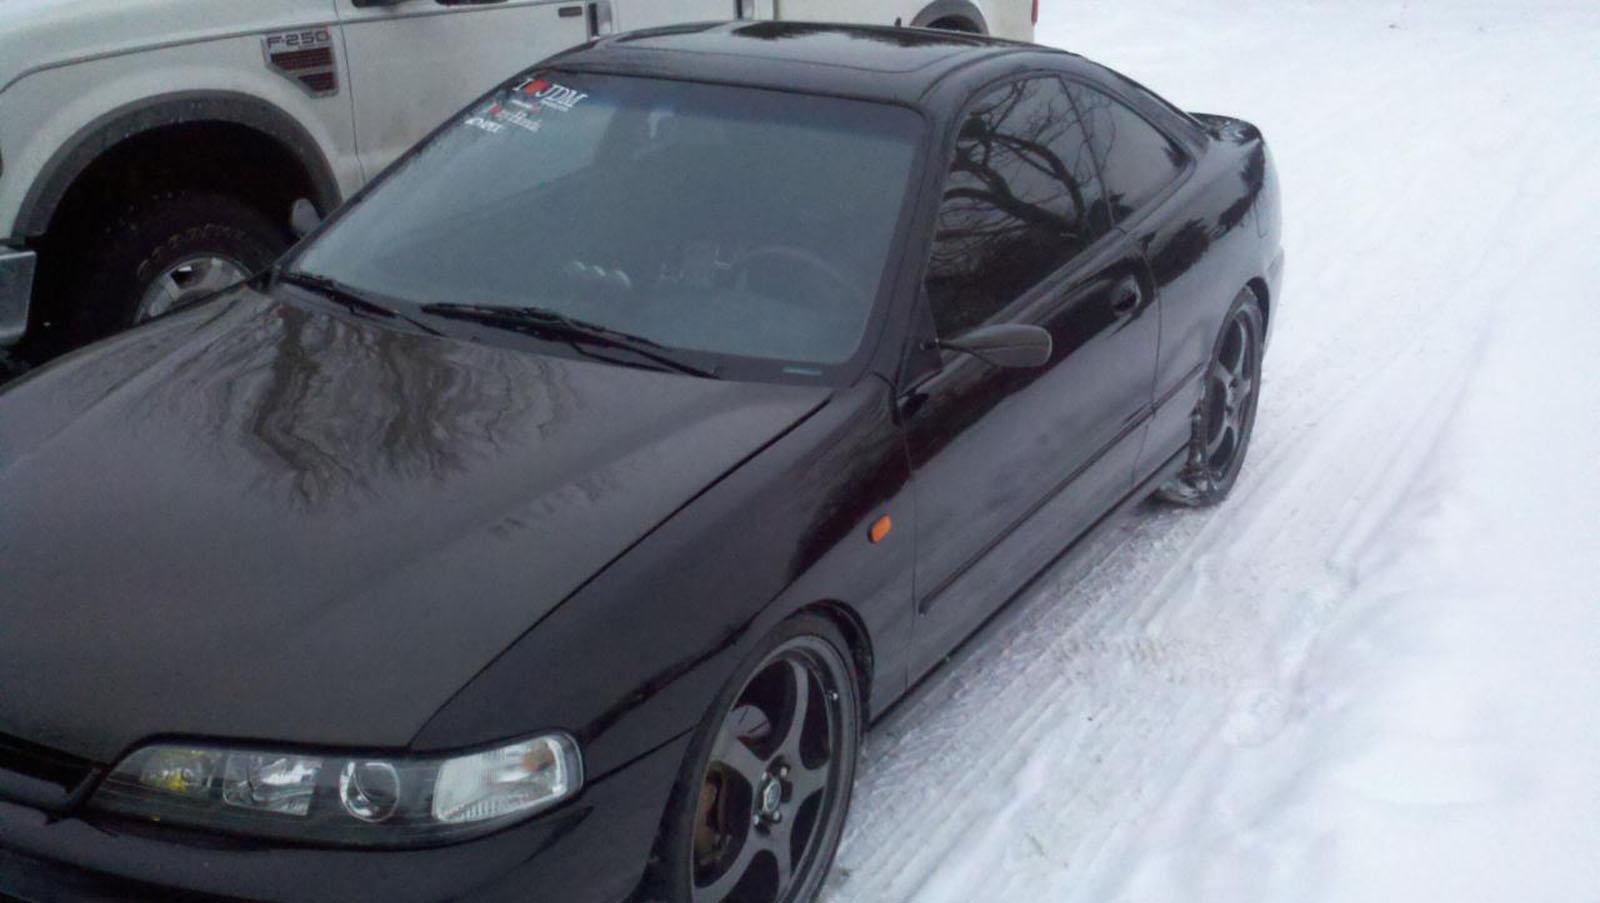 1995 acura jdm itr integra gs r for sale ohio for Integra motor for sale